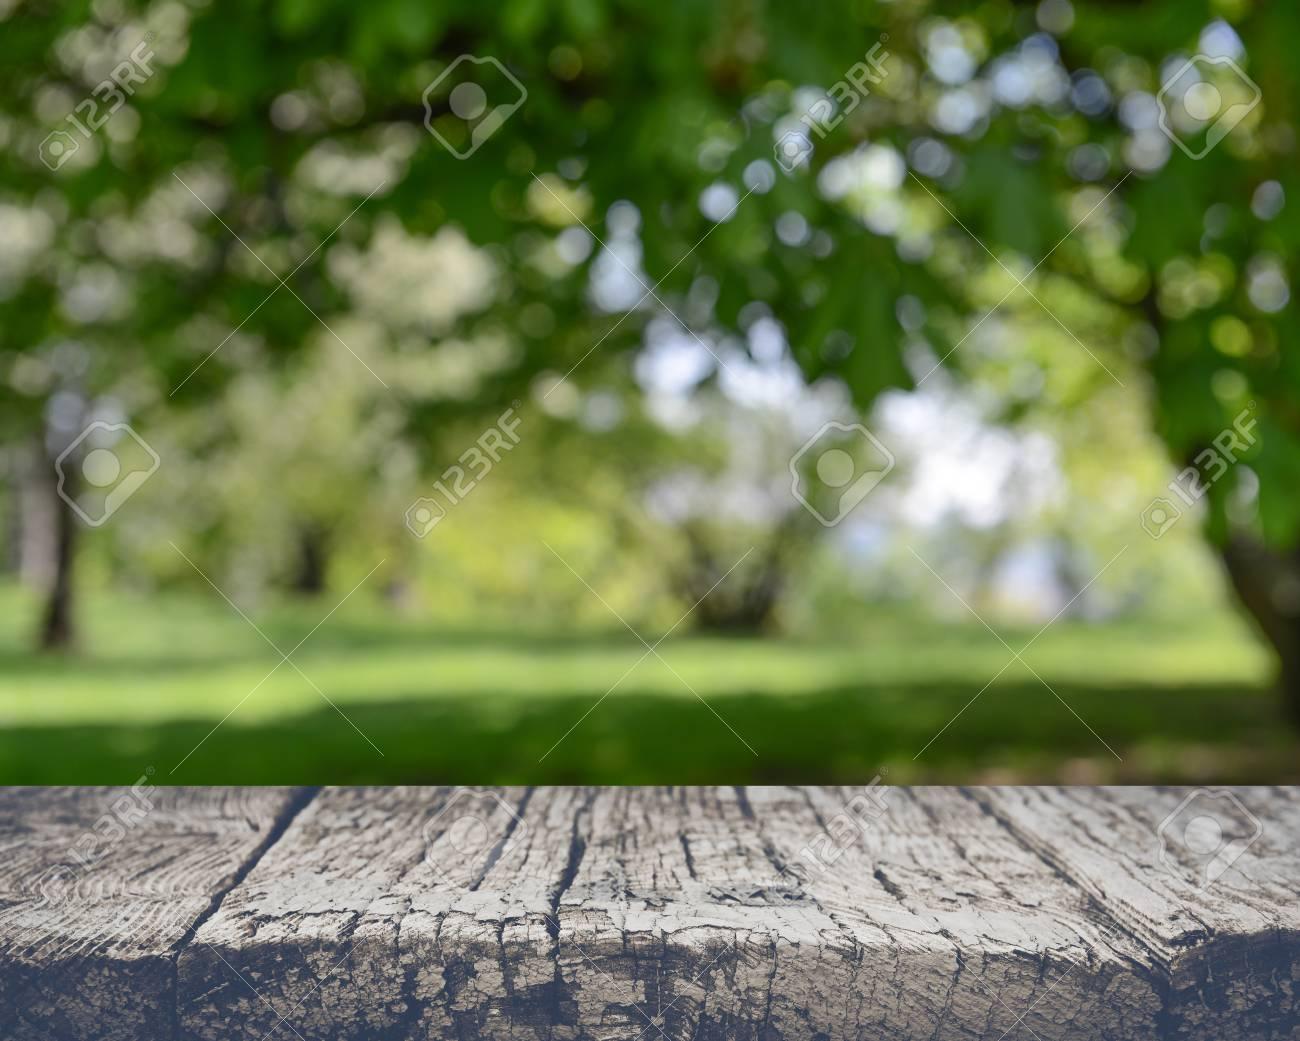 Blurred Nature Background - 55007860